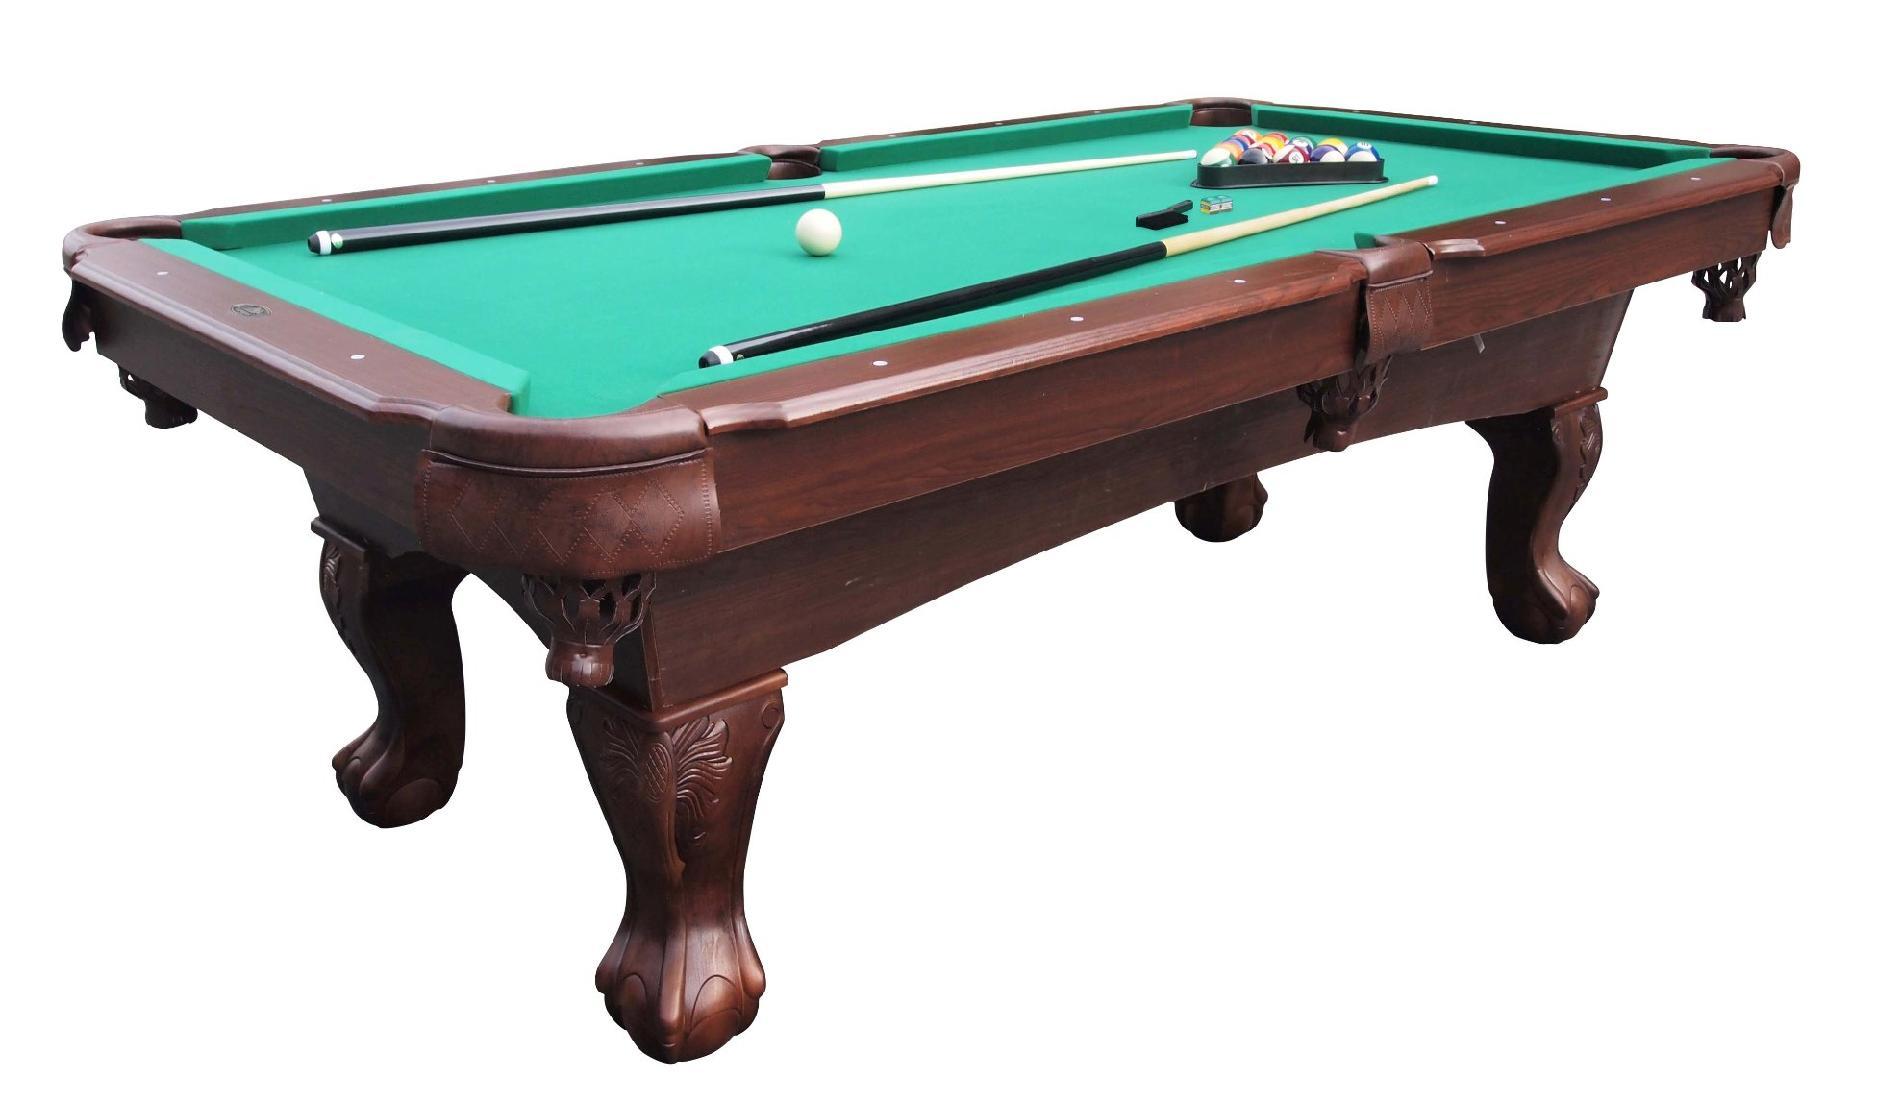 md sports springdale 7 5 ft billiard table with bonus cue